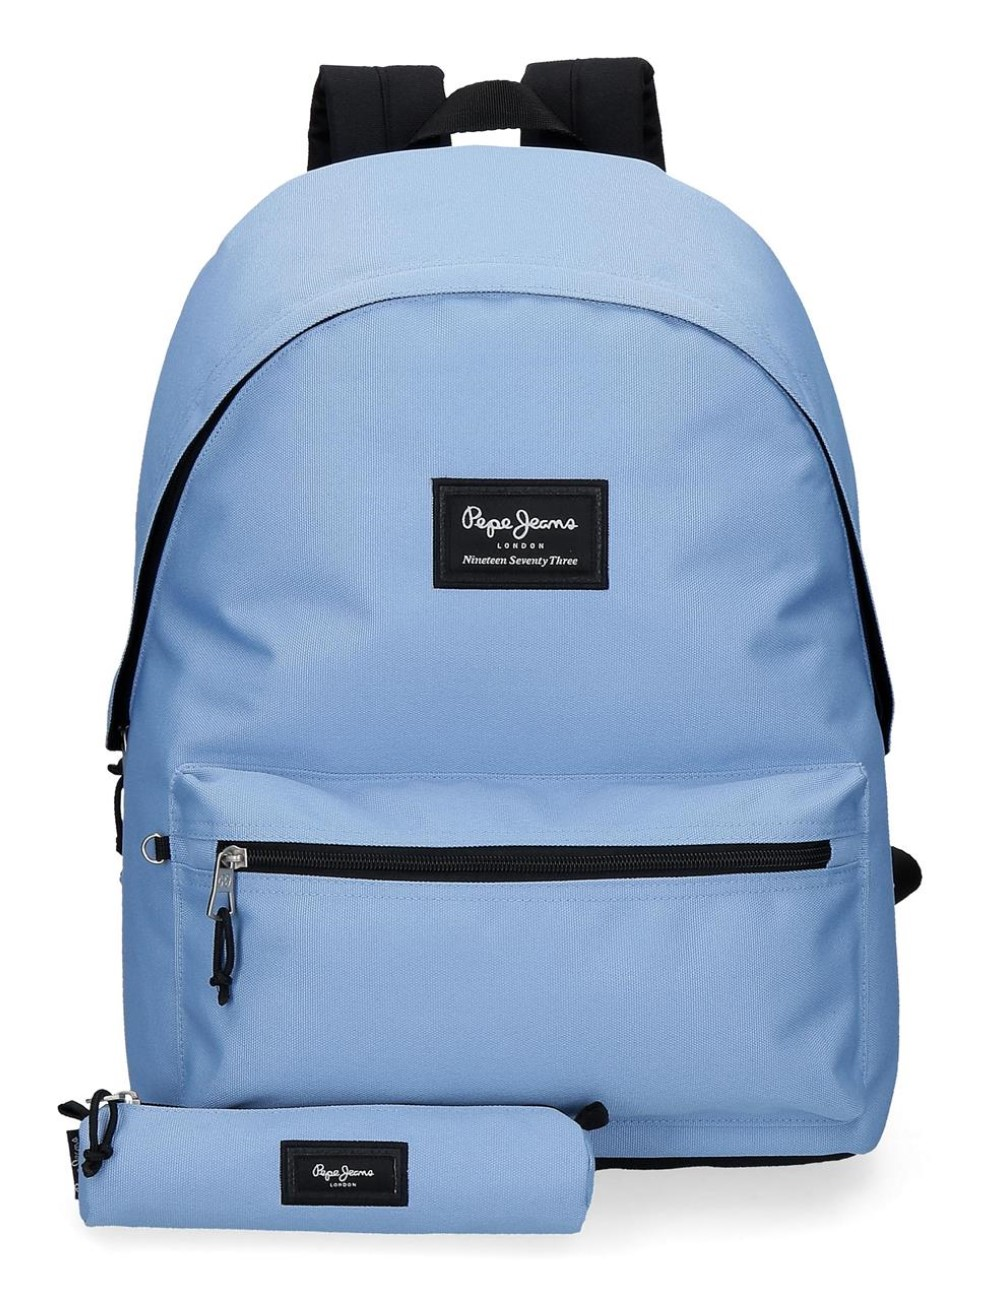 Mochila Un Compartimento Portaordenador + Portatodo Pepe Jeans Colorful azul 6329225